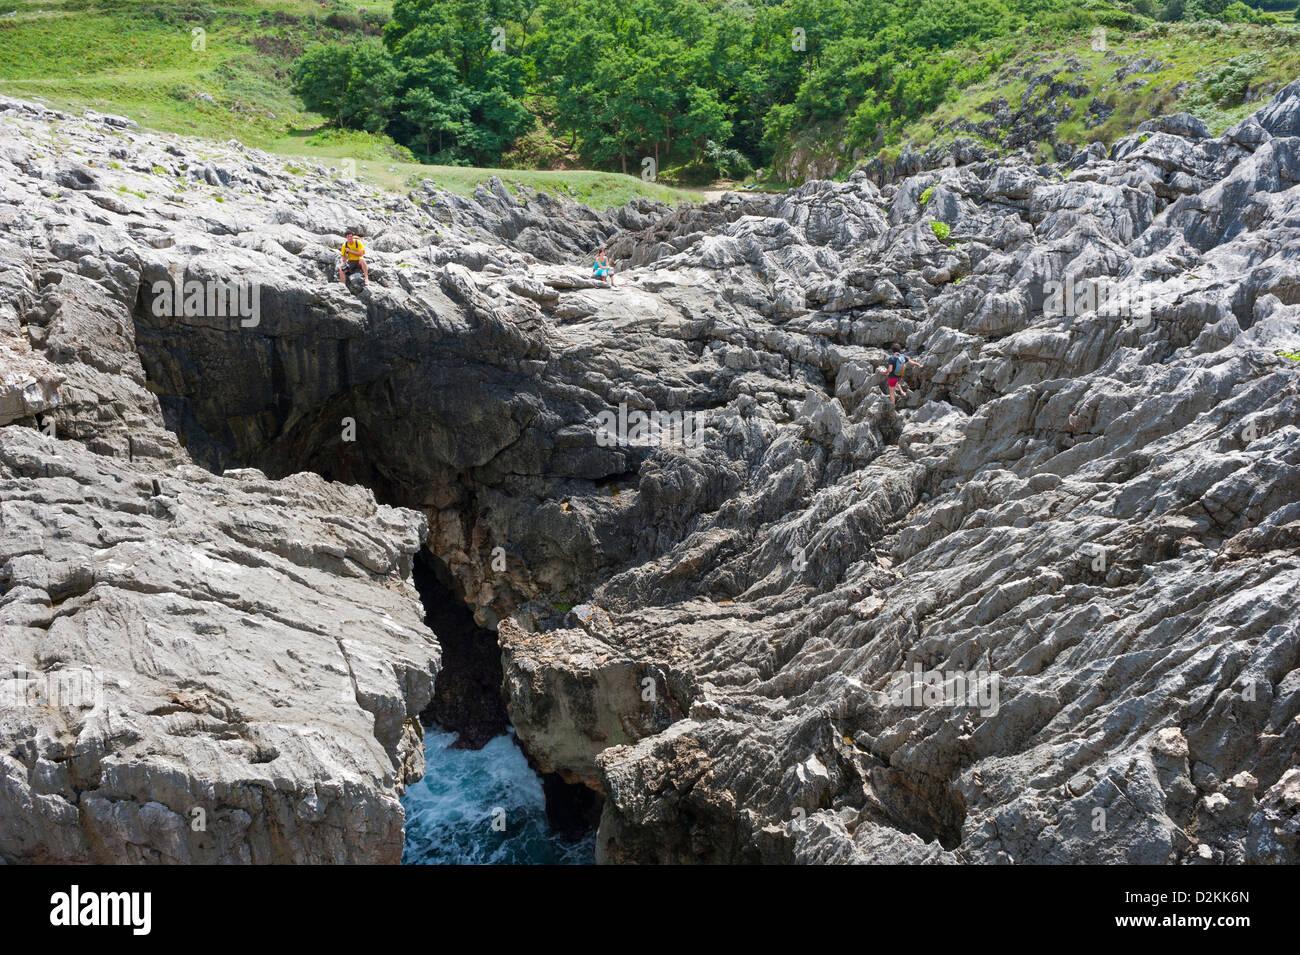 group of people on a coastal rock, provinces of Asturias, Spain - Stock Image